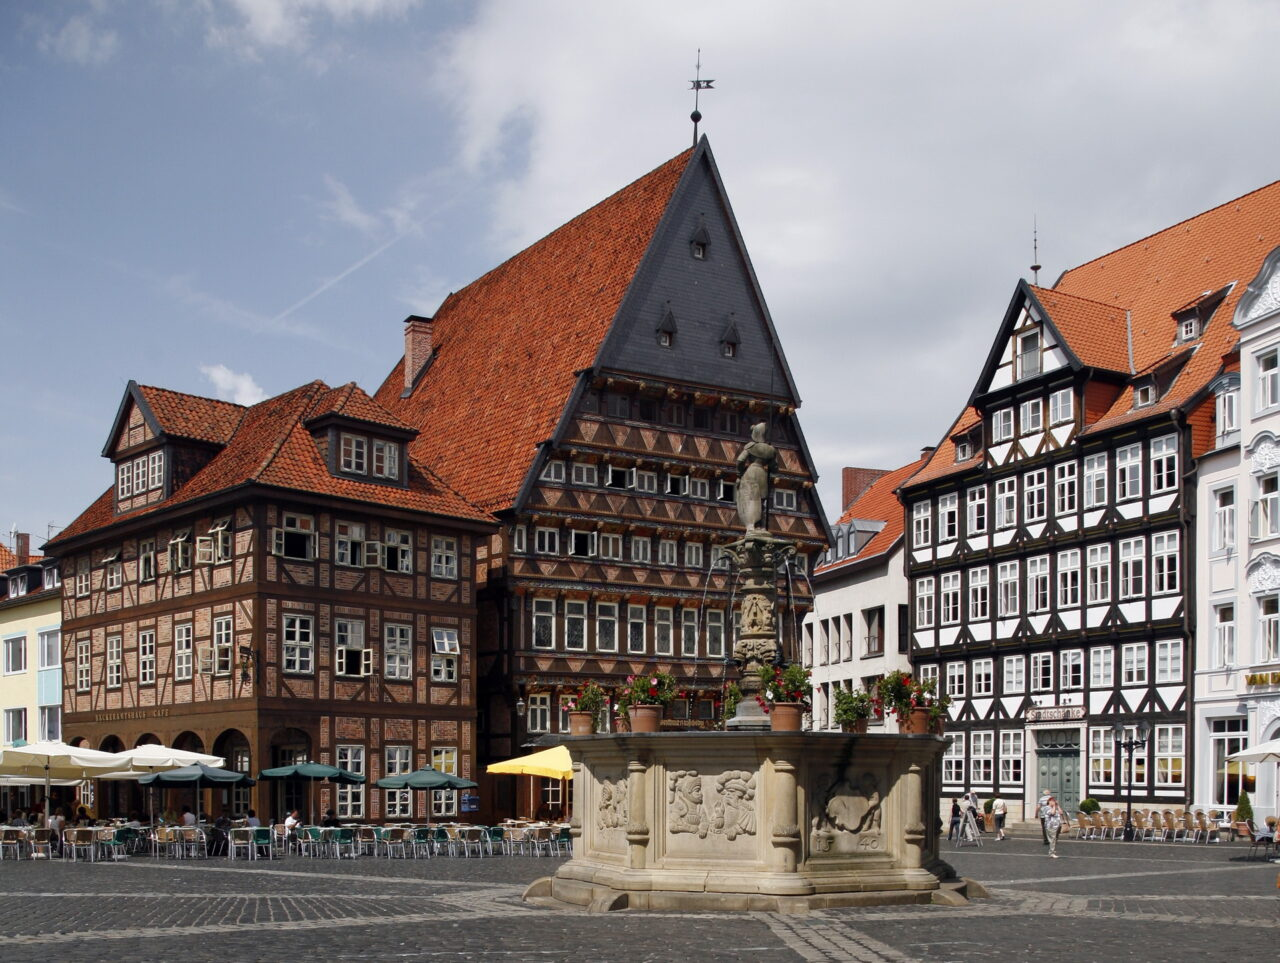 https://intelligent-investors.de/wp-content/uploads/2021/07/Hildesheim_2-1280x963.jpg